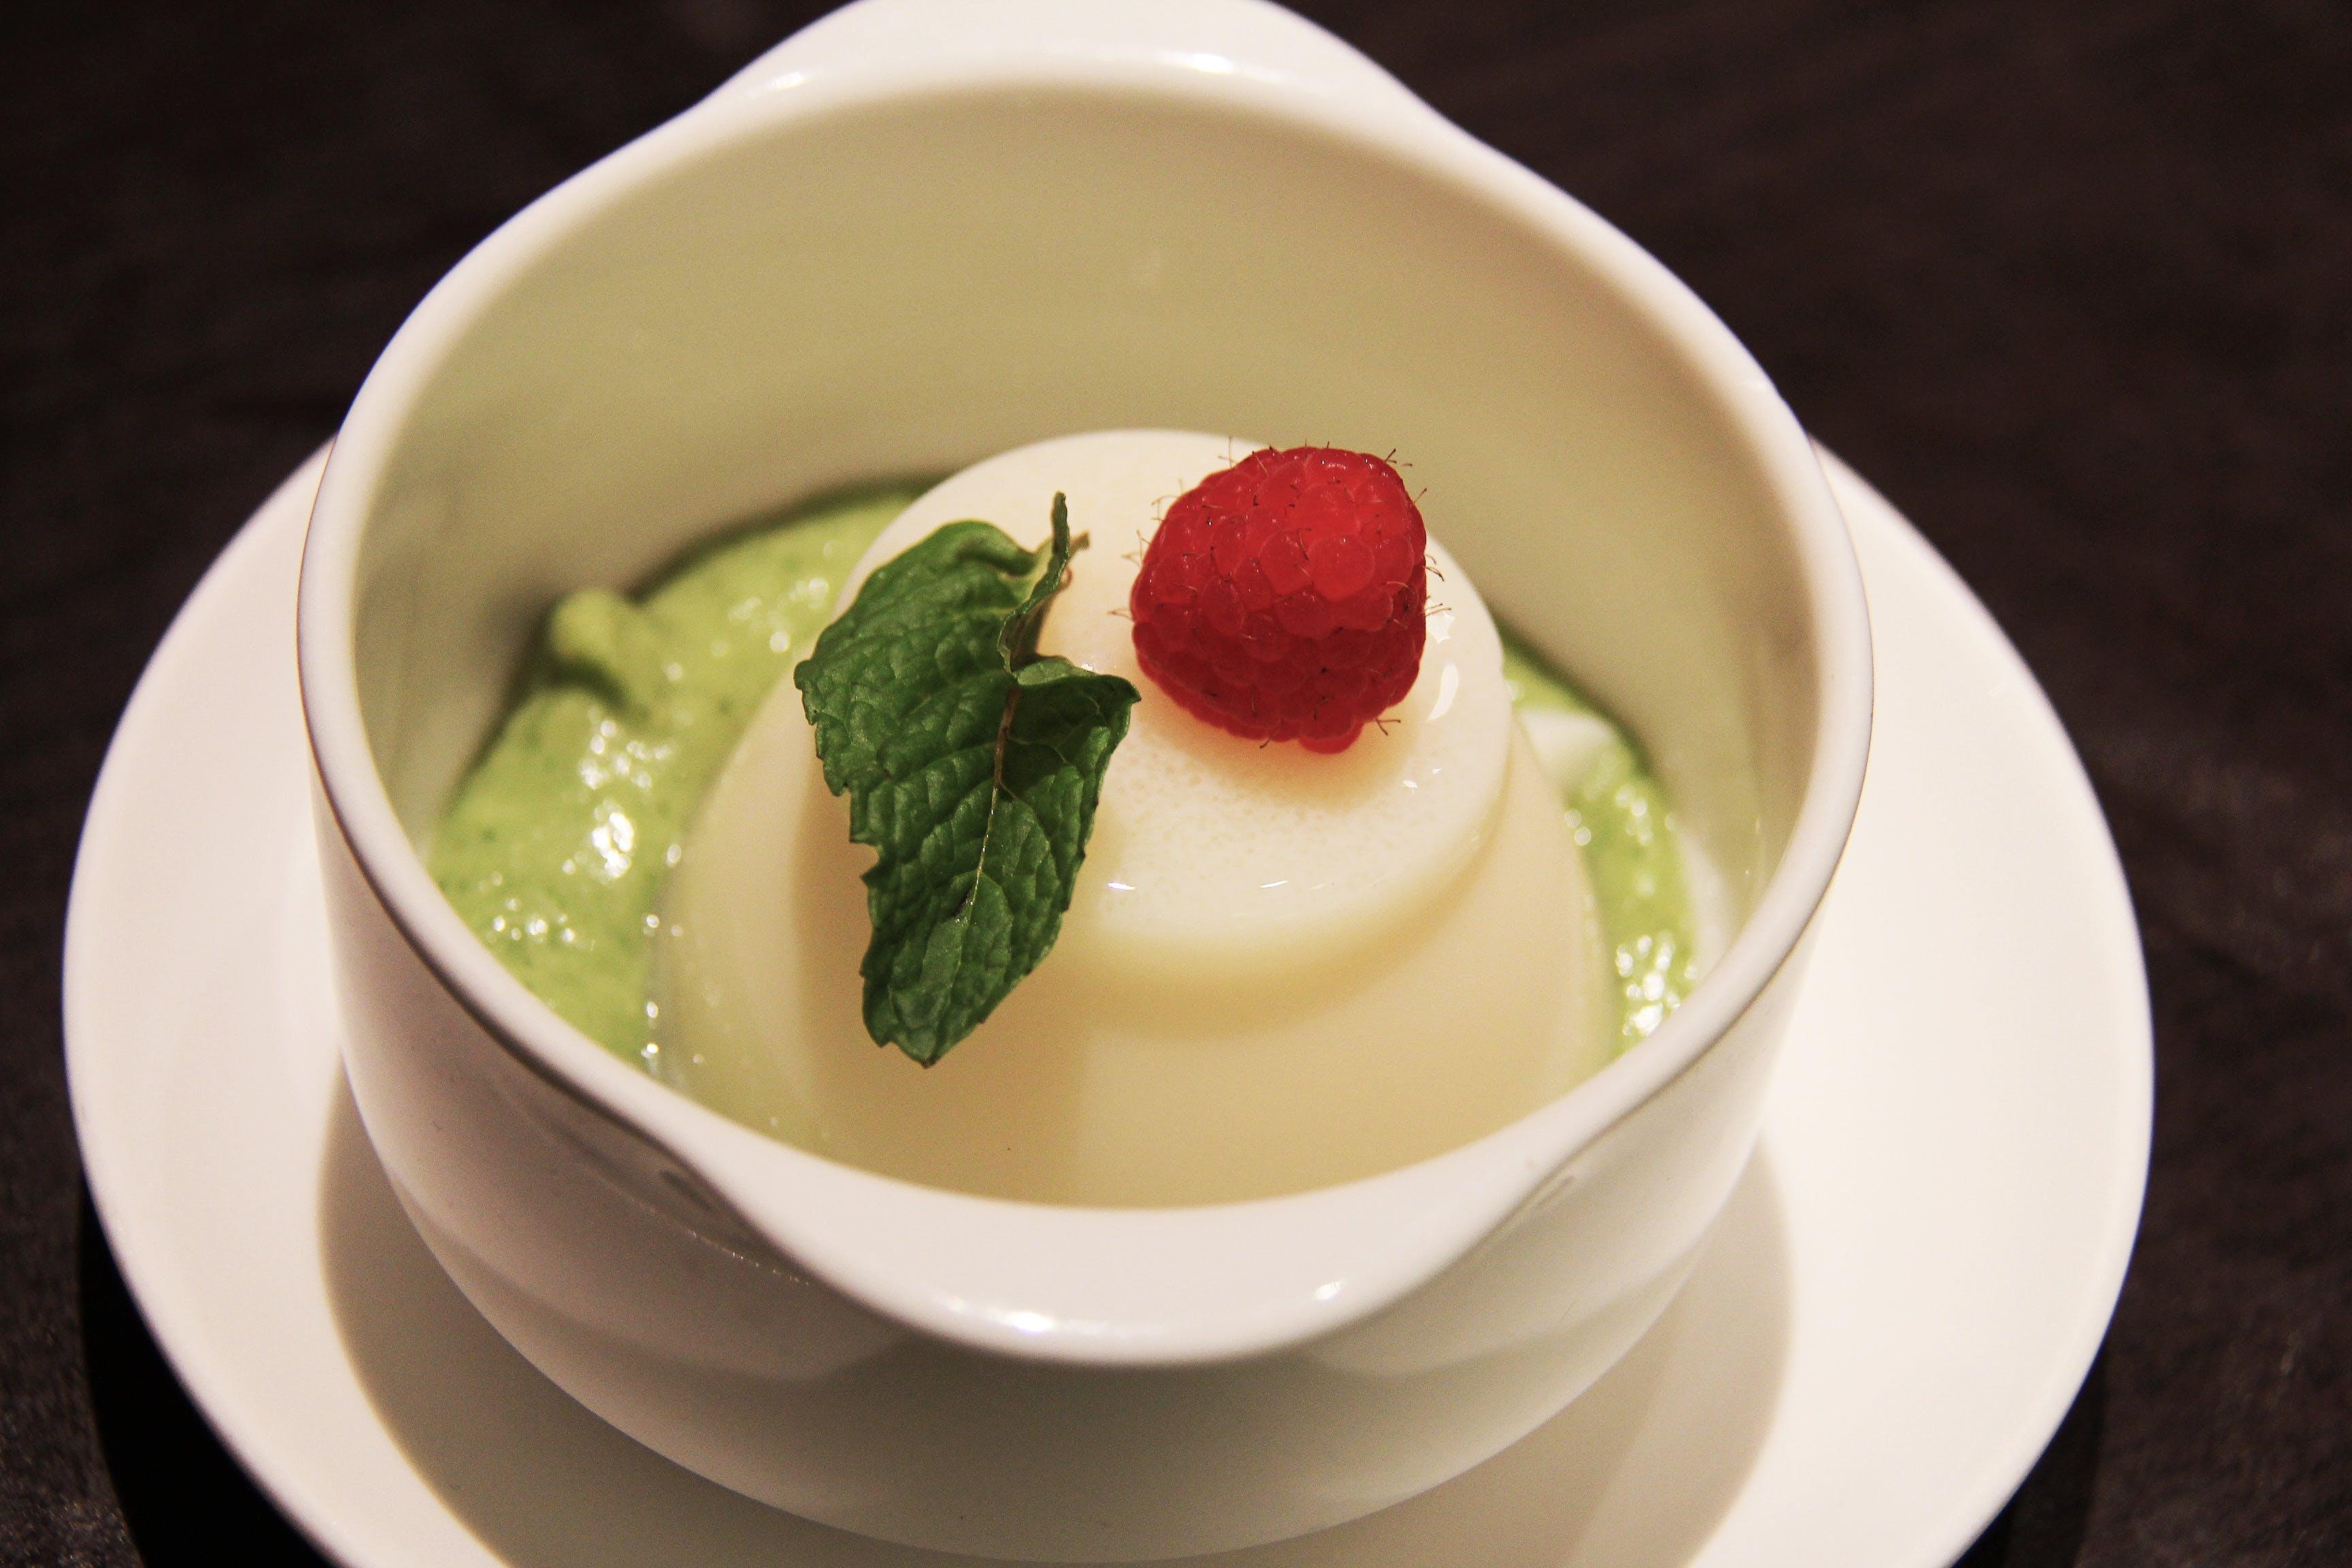 White Ceramic Bowl With White and Green Cream